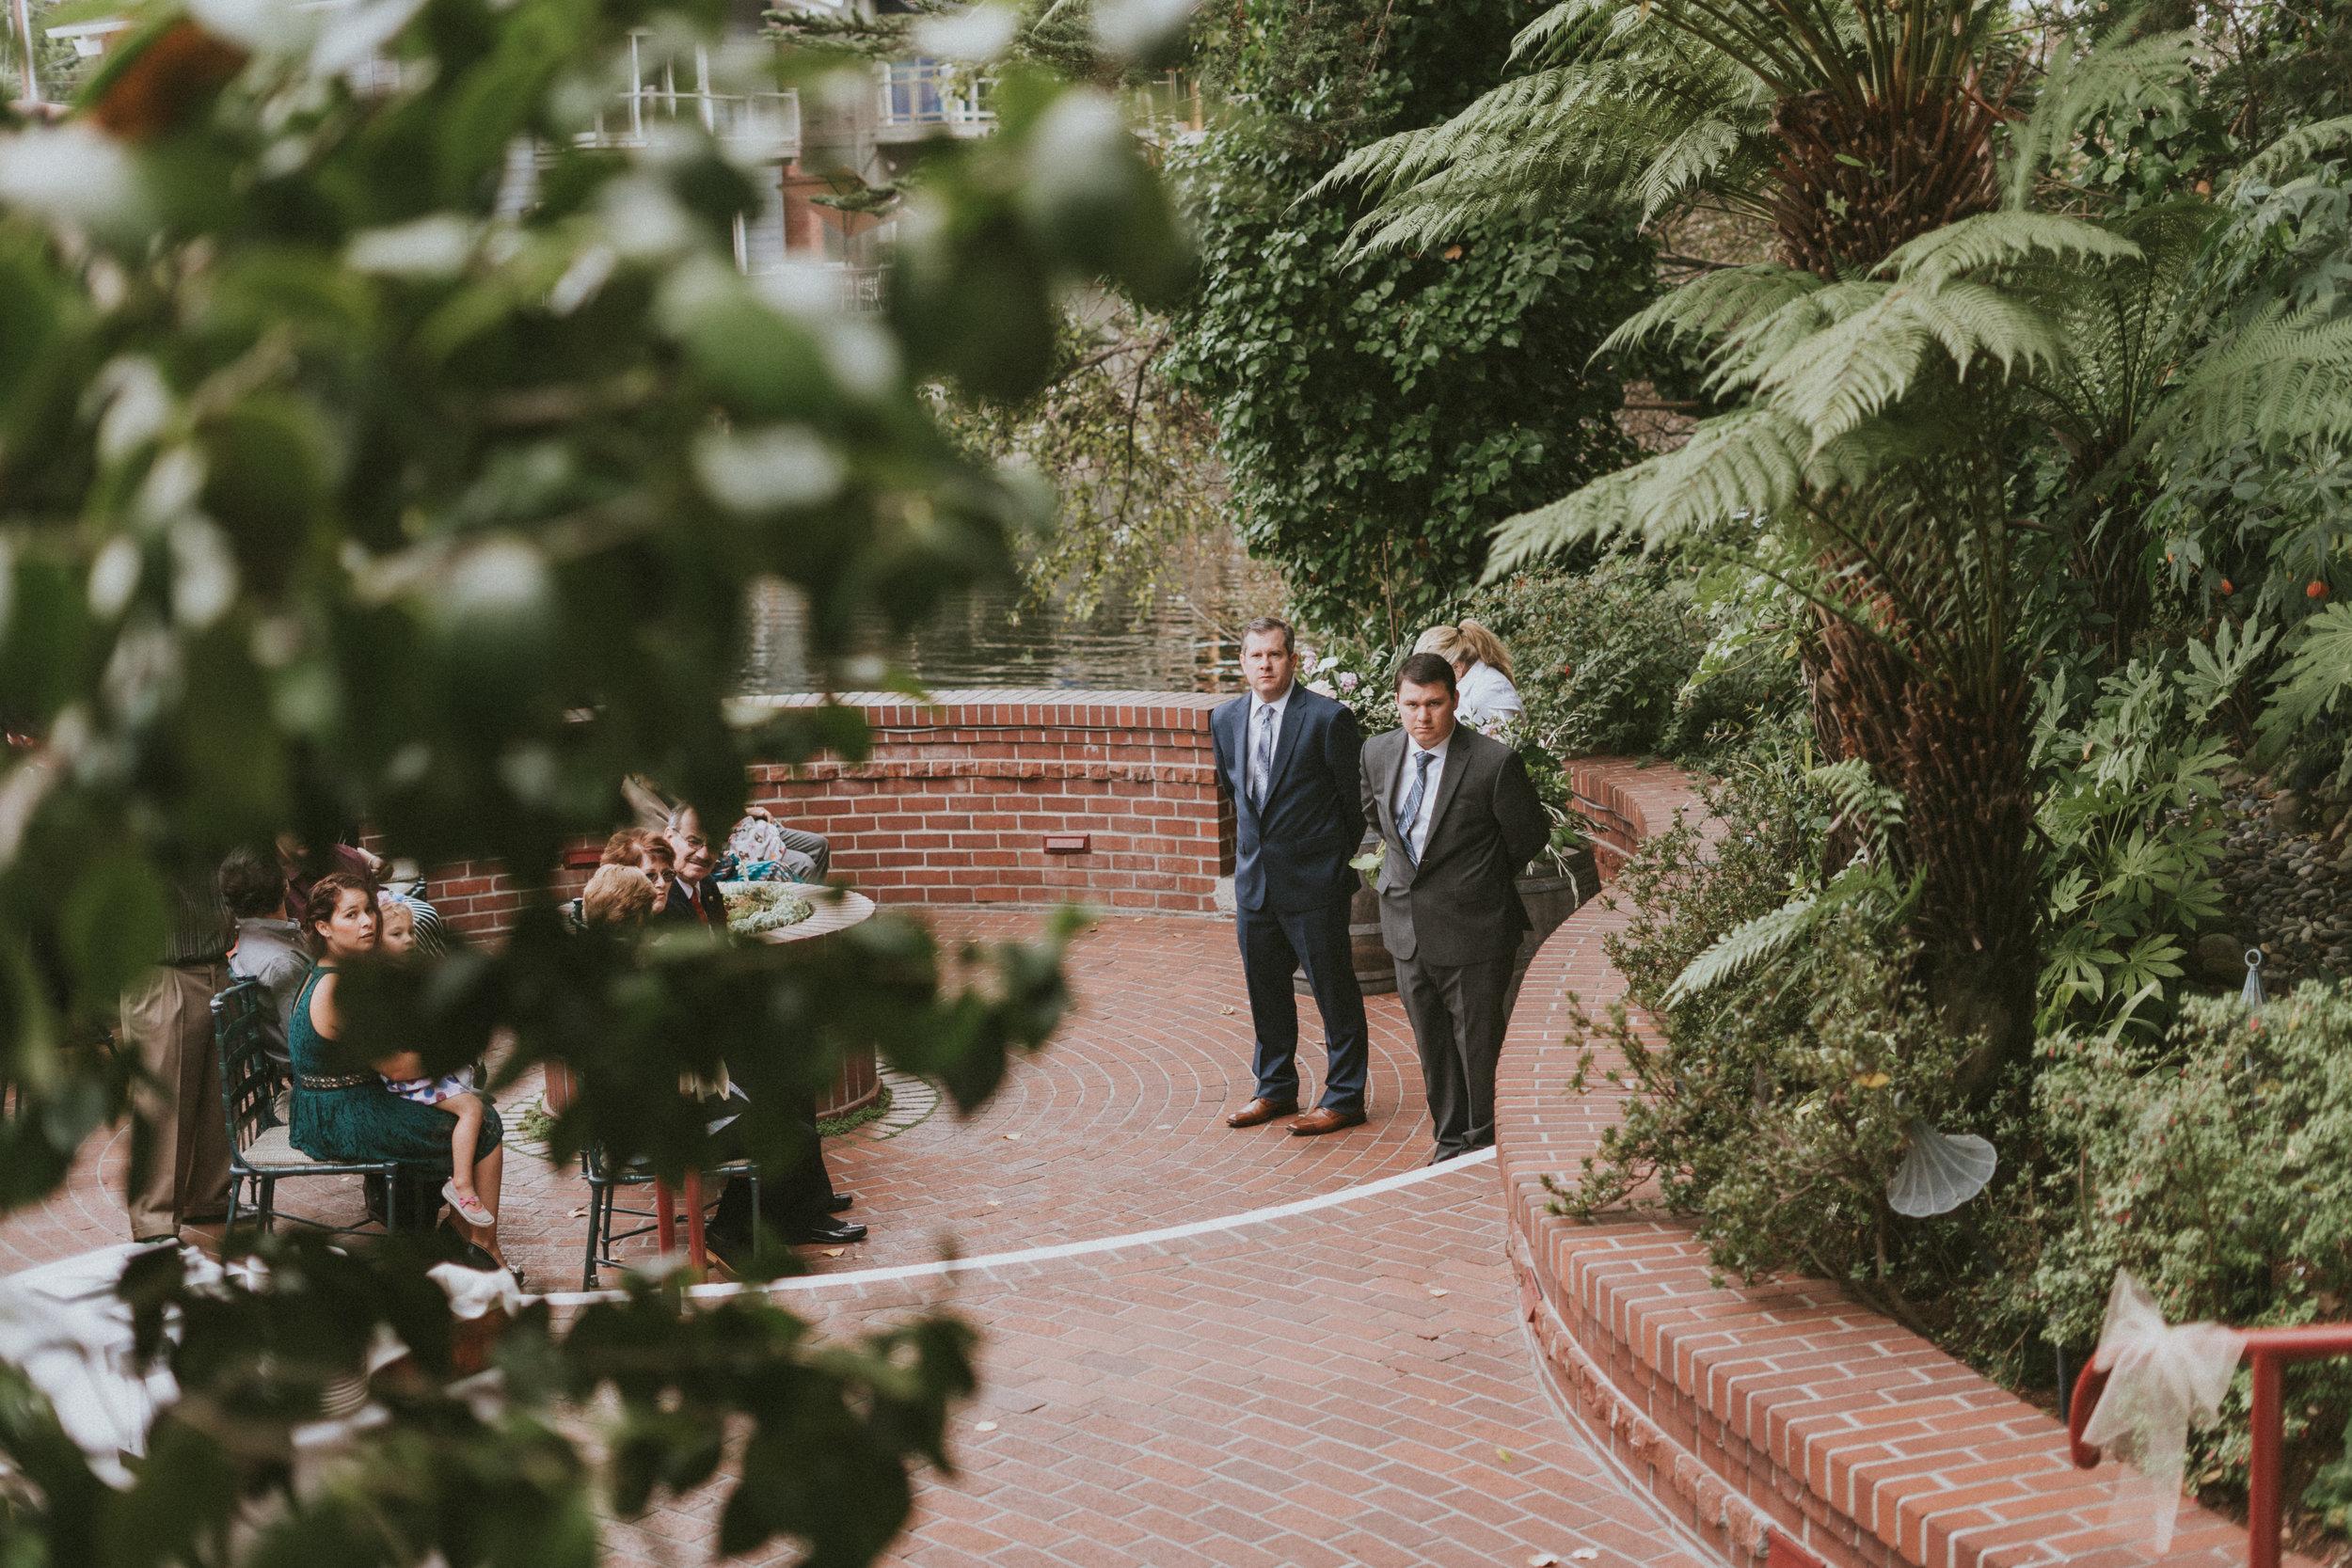 Capitola-Santa-Cruz-wedding-photographer-124.jpg